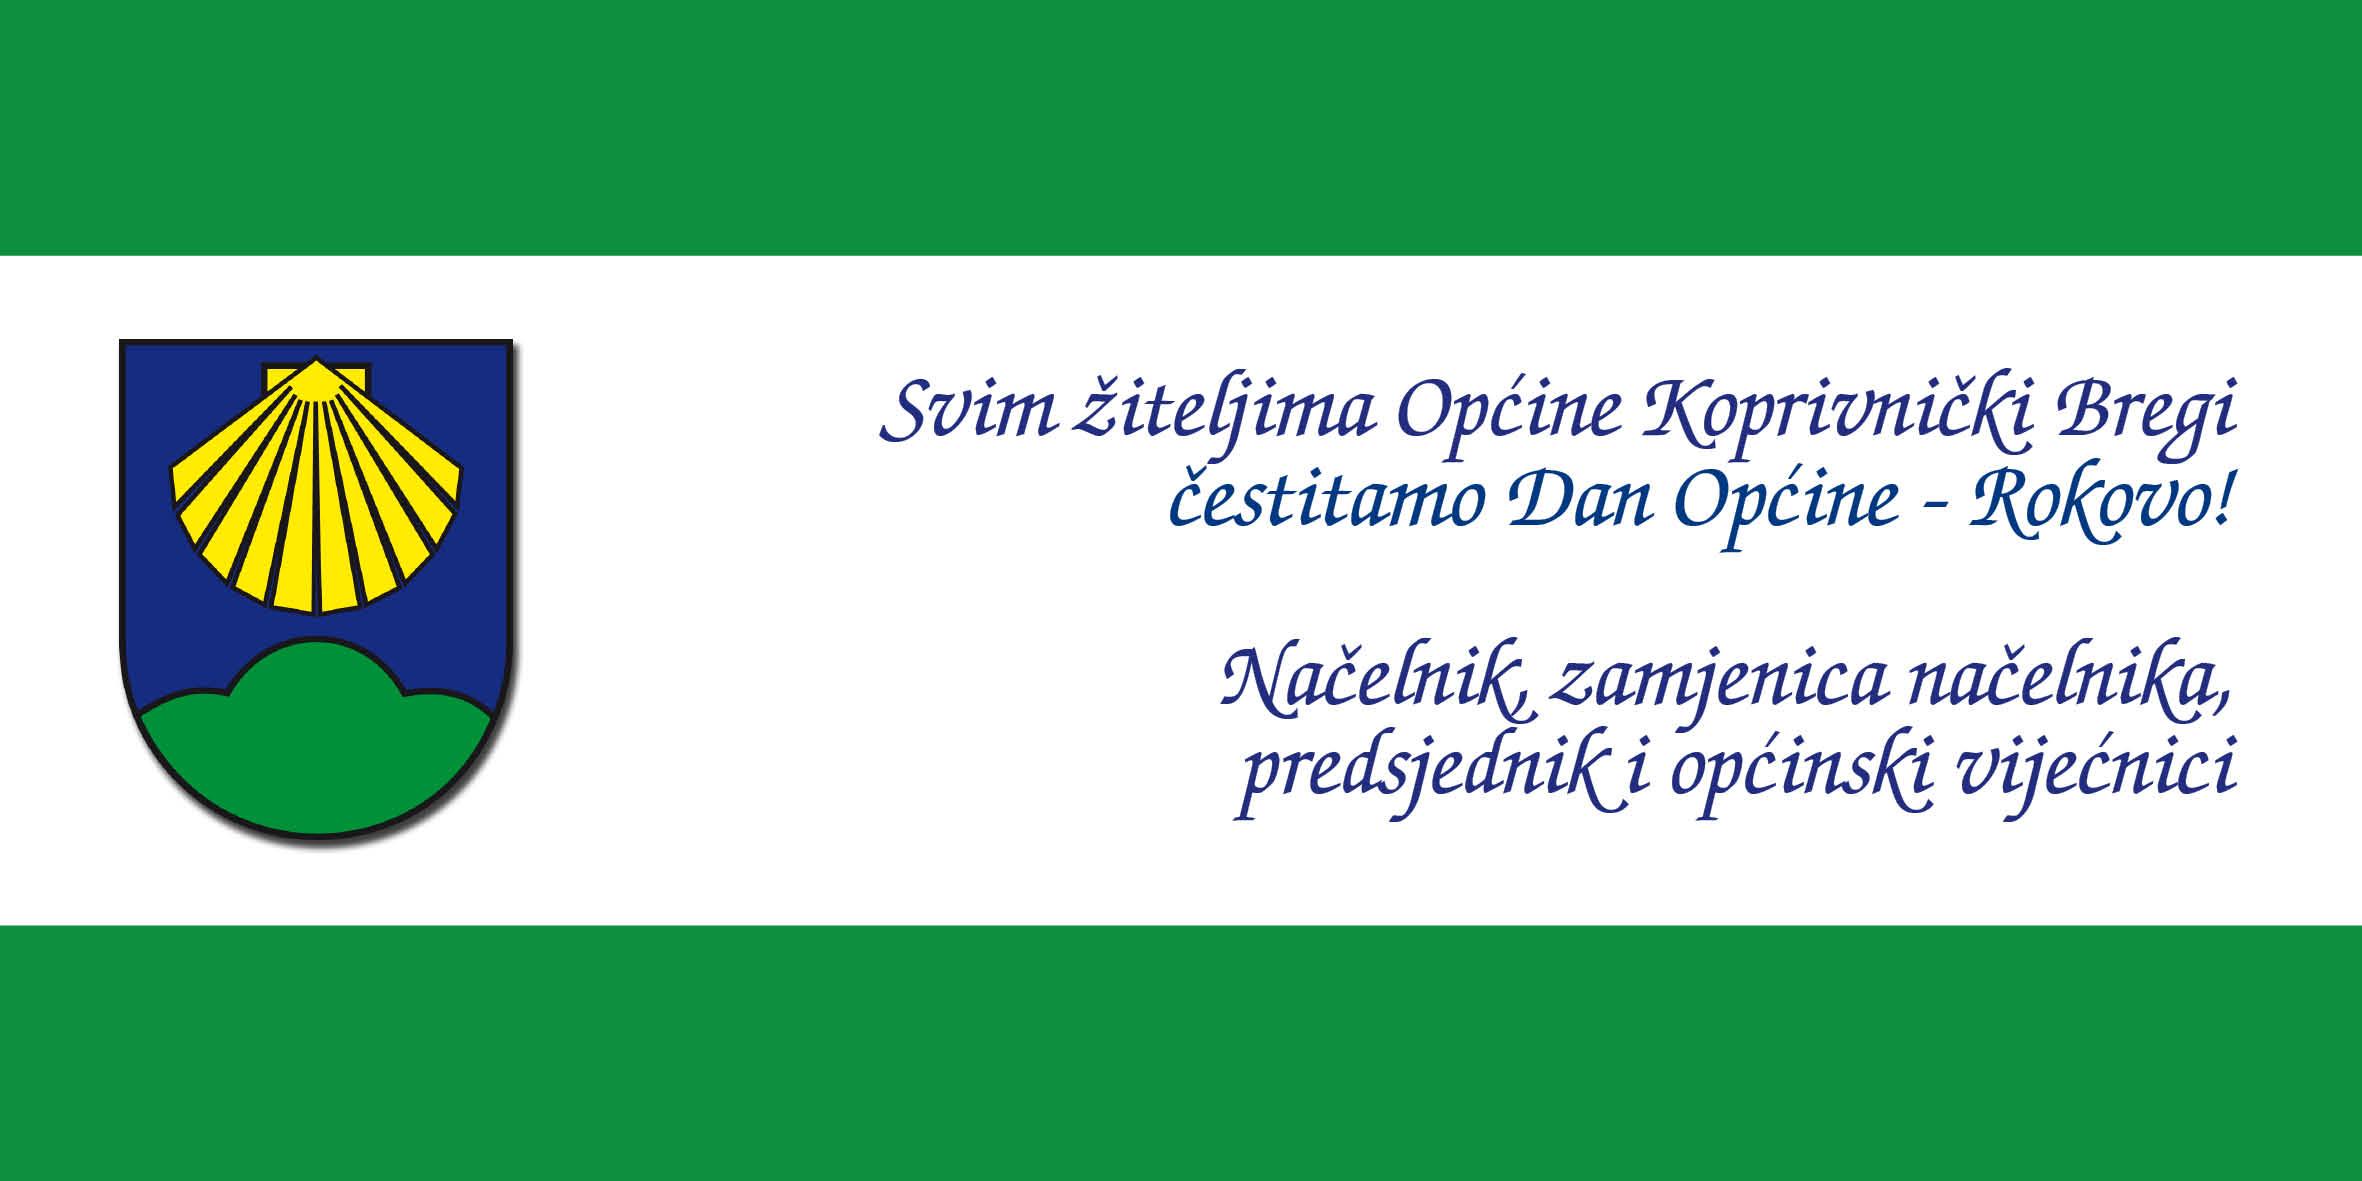 Dan opcine Koprivnicki Bregi